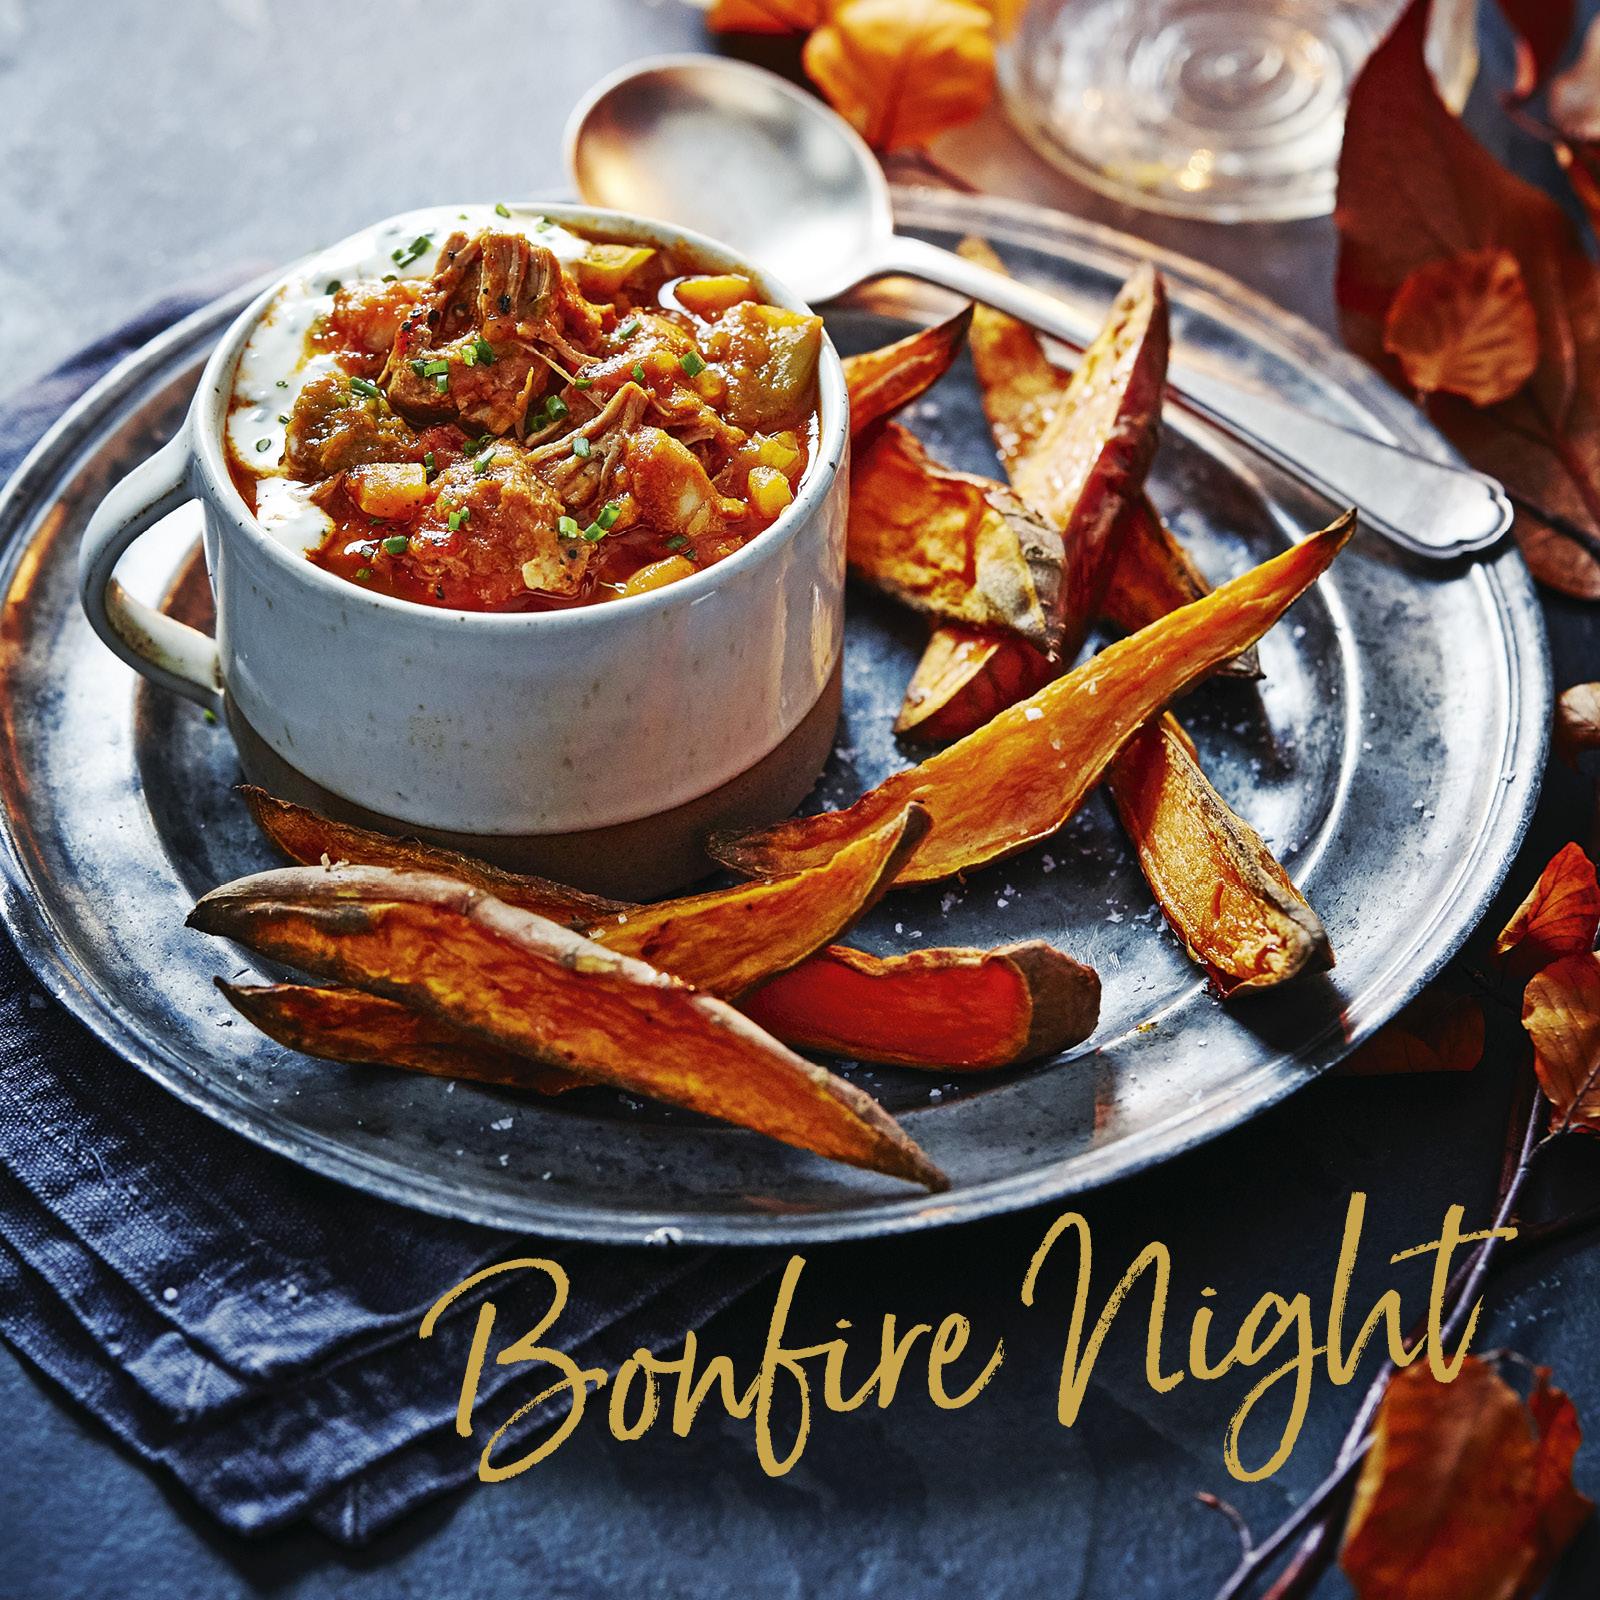 SW recipe: Smoky pork and bean stew with garlic yogurt and sweet potato wedges